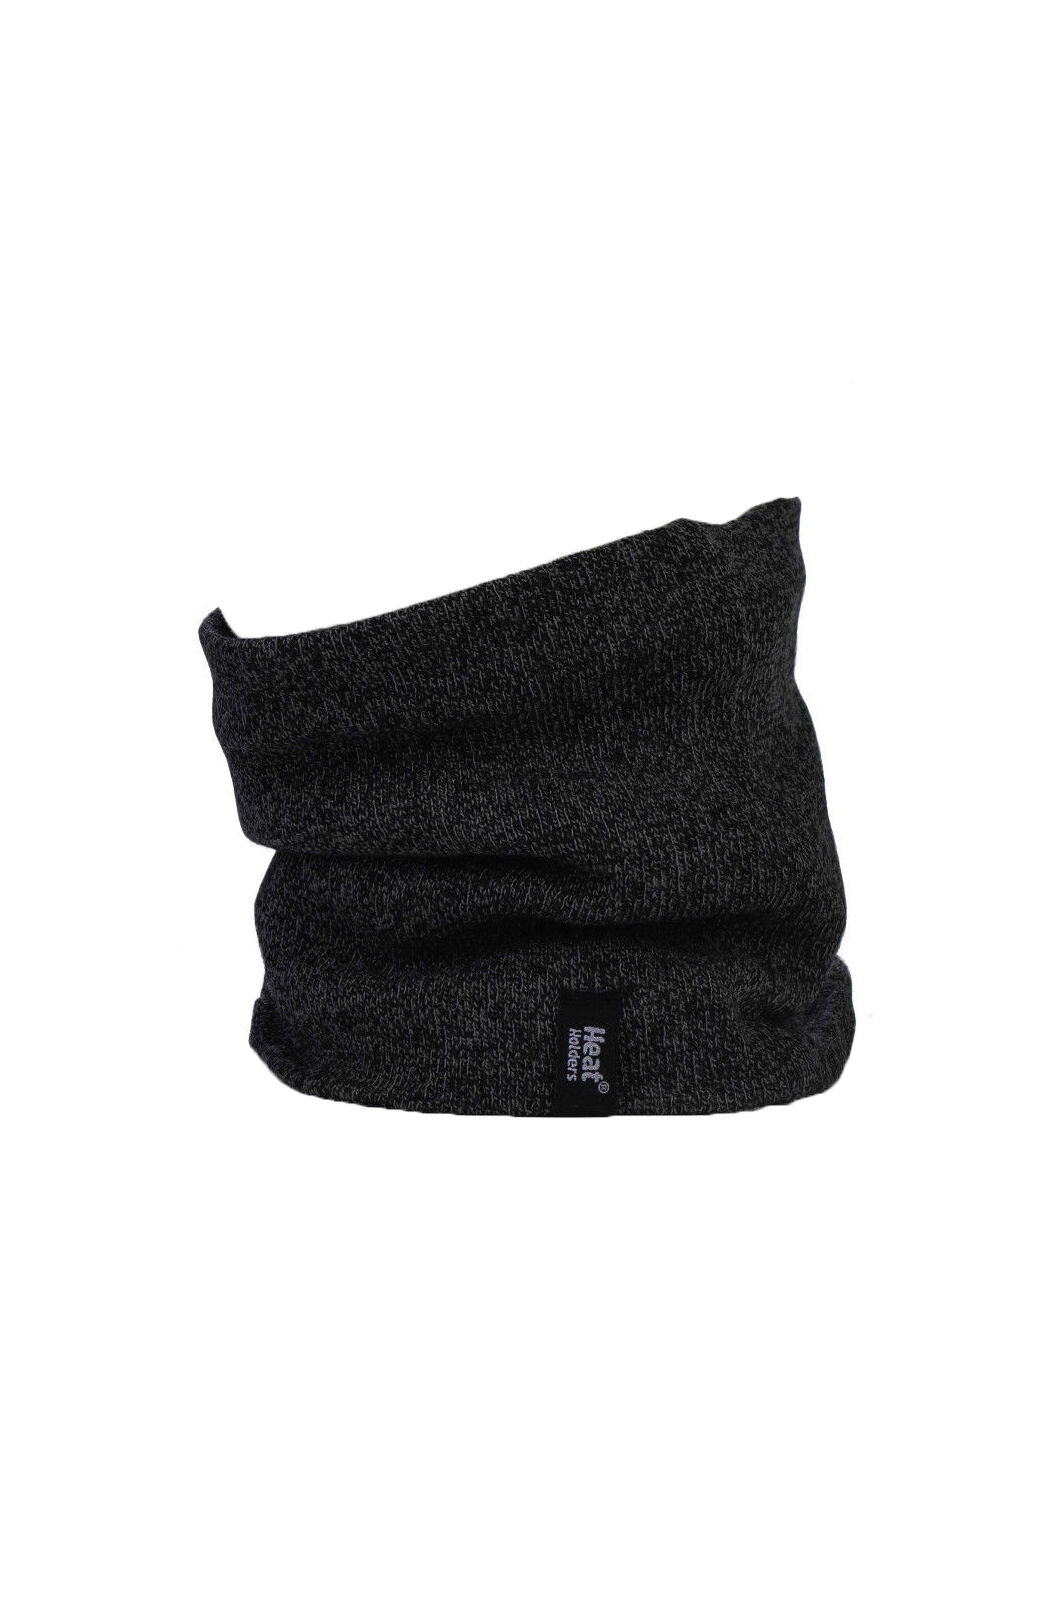 Heat Holders - Mens Clothes Set including Ski Socks, Gloves and Neckwarmer S/M